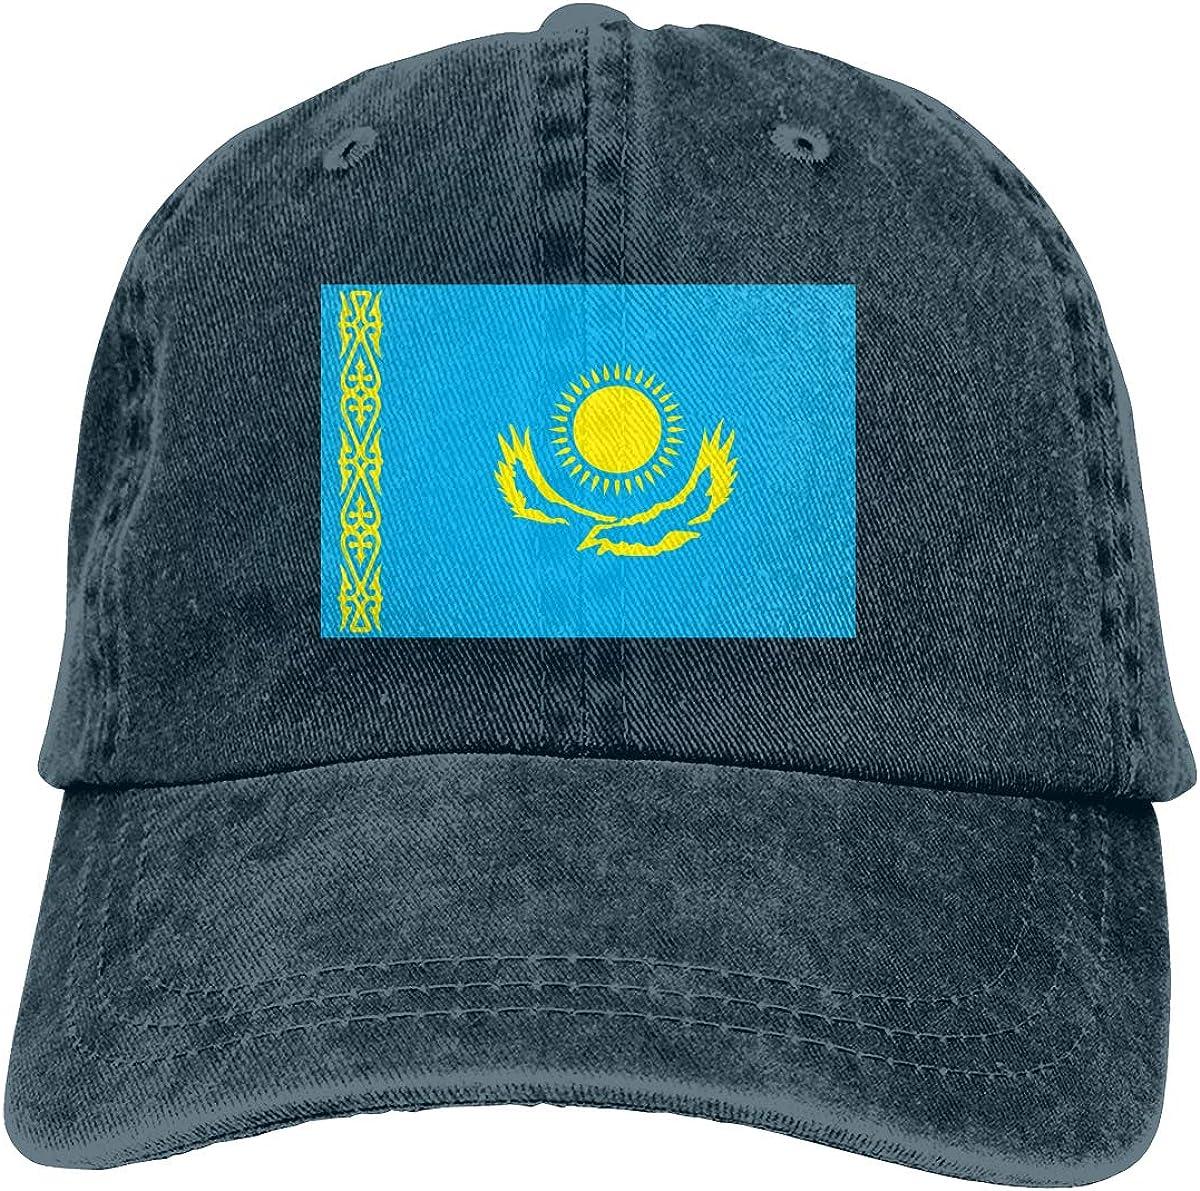 Amayc Adjustable Mens Denim Baseball Caps Kazakhstan Flag Funny Cotton Hats